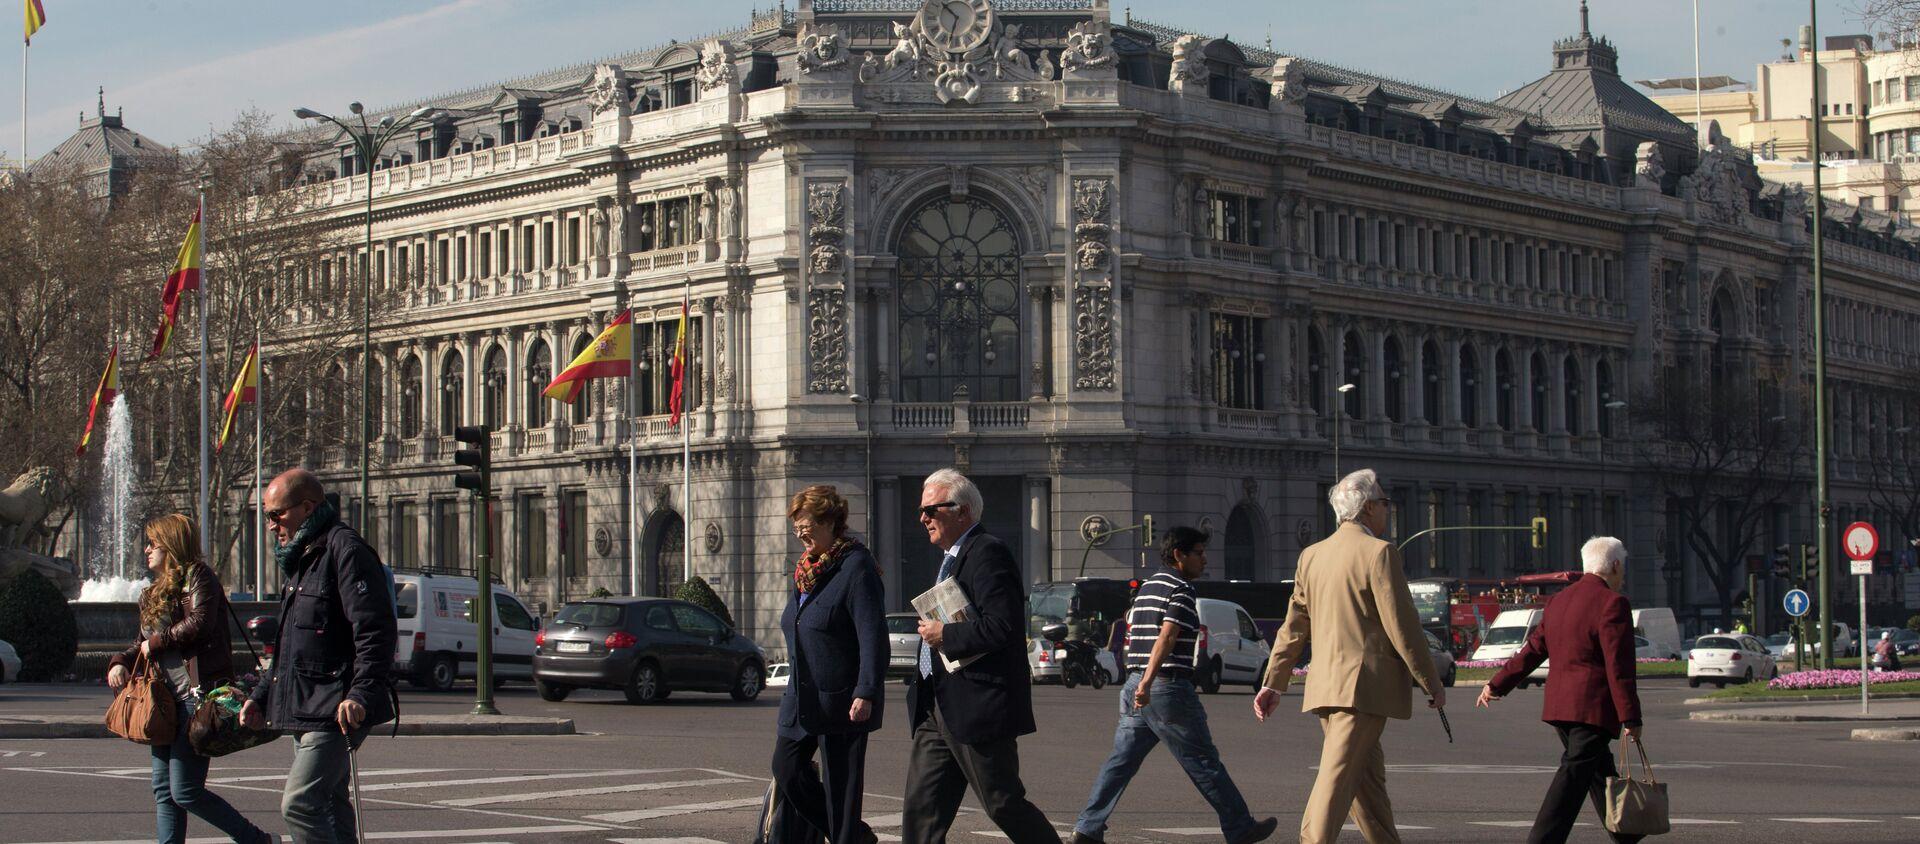 Banco Central de España en Madrid (archivo) - Sputnik Mundo, 1920, 08.07.2019